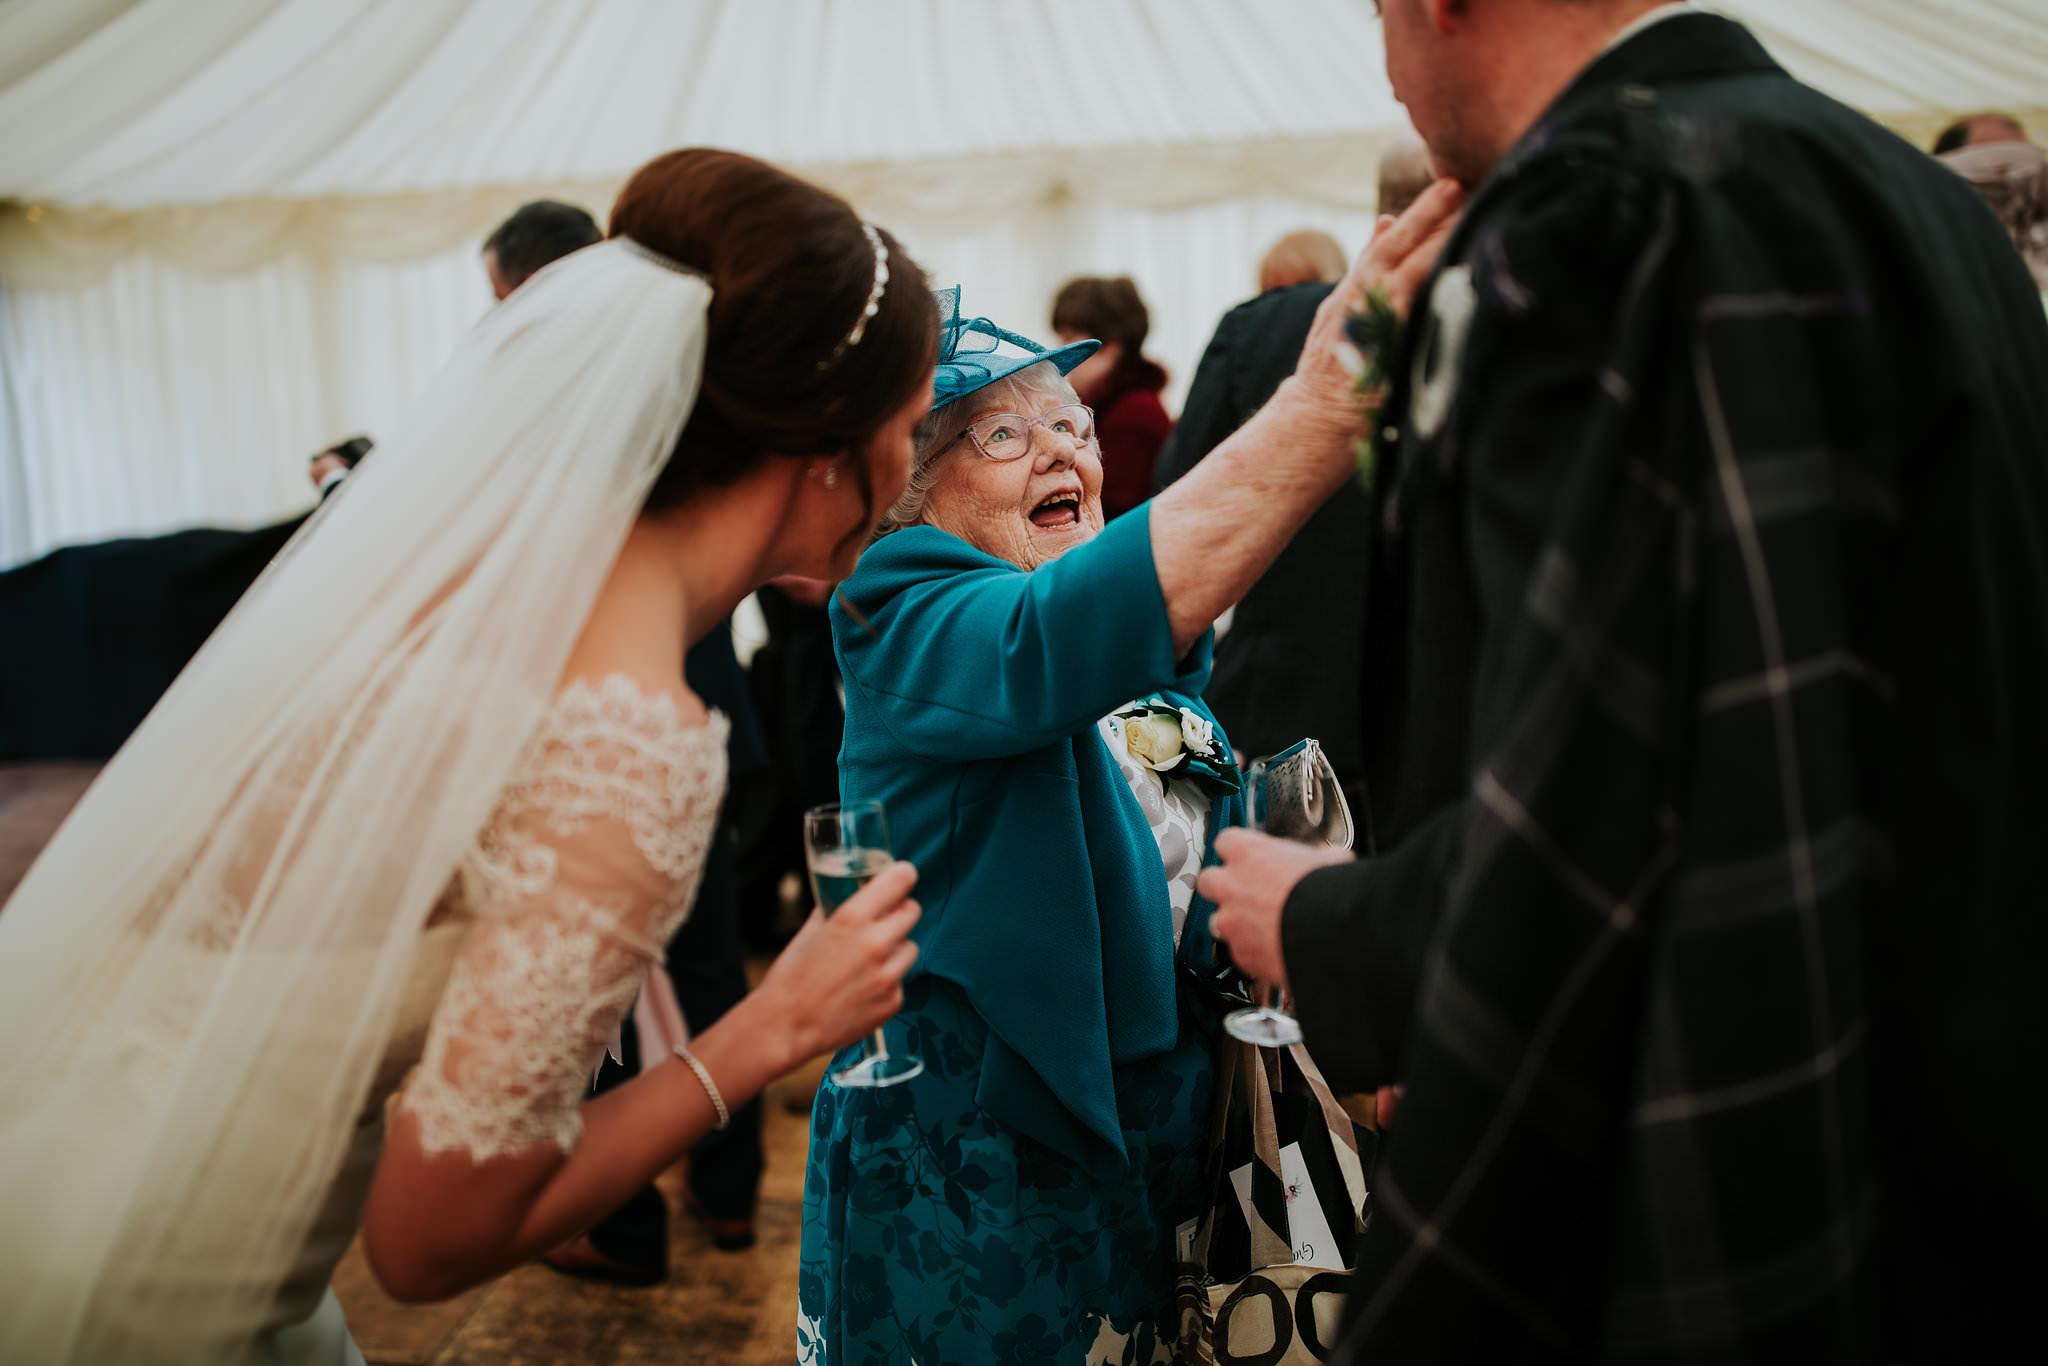 kirknewton stables wedding photographer (44).jpg